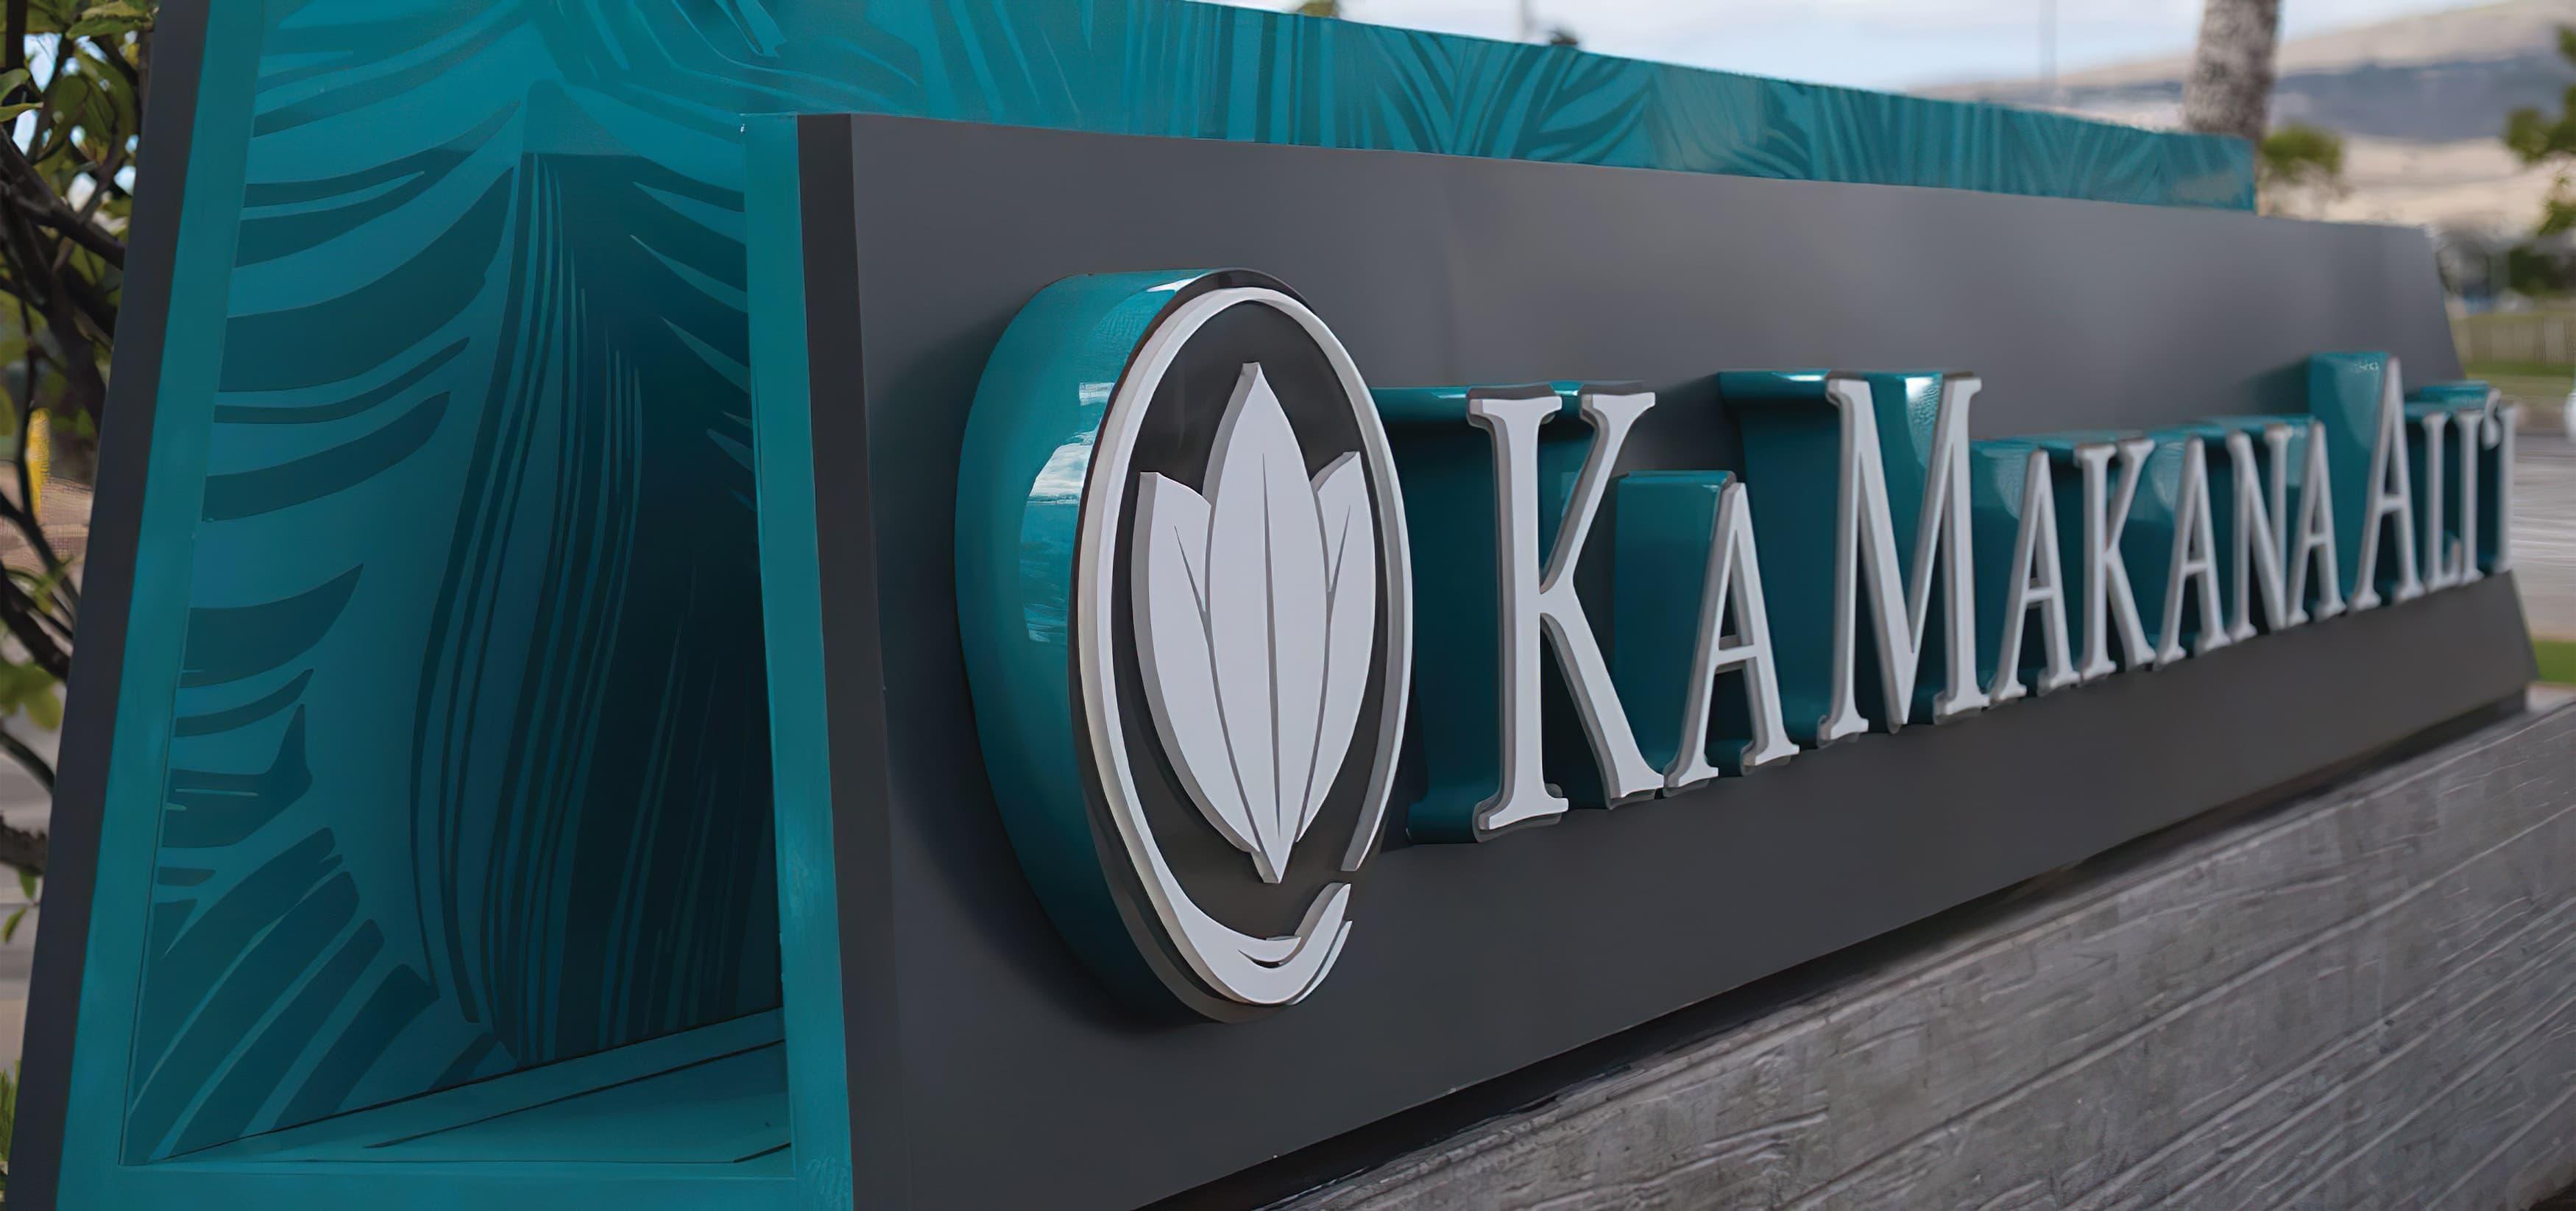 Ka Makana Ali'i, a shopping center outside Honolulu, Hawaii. RSM Design. Signage and Wayfinding Design. Project Identity Monument.